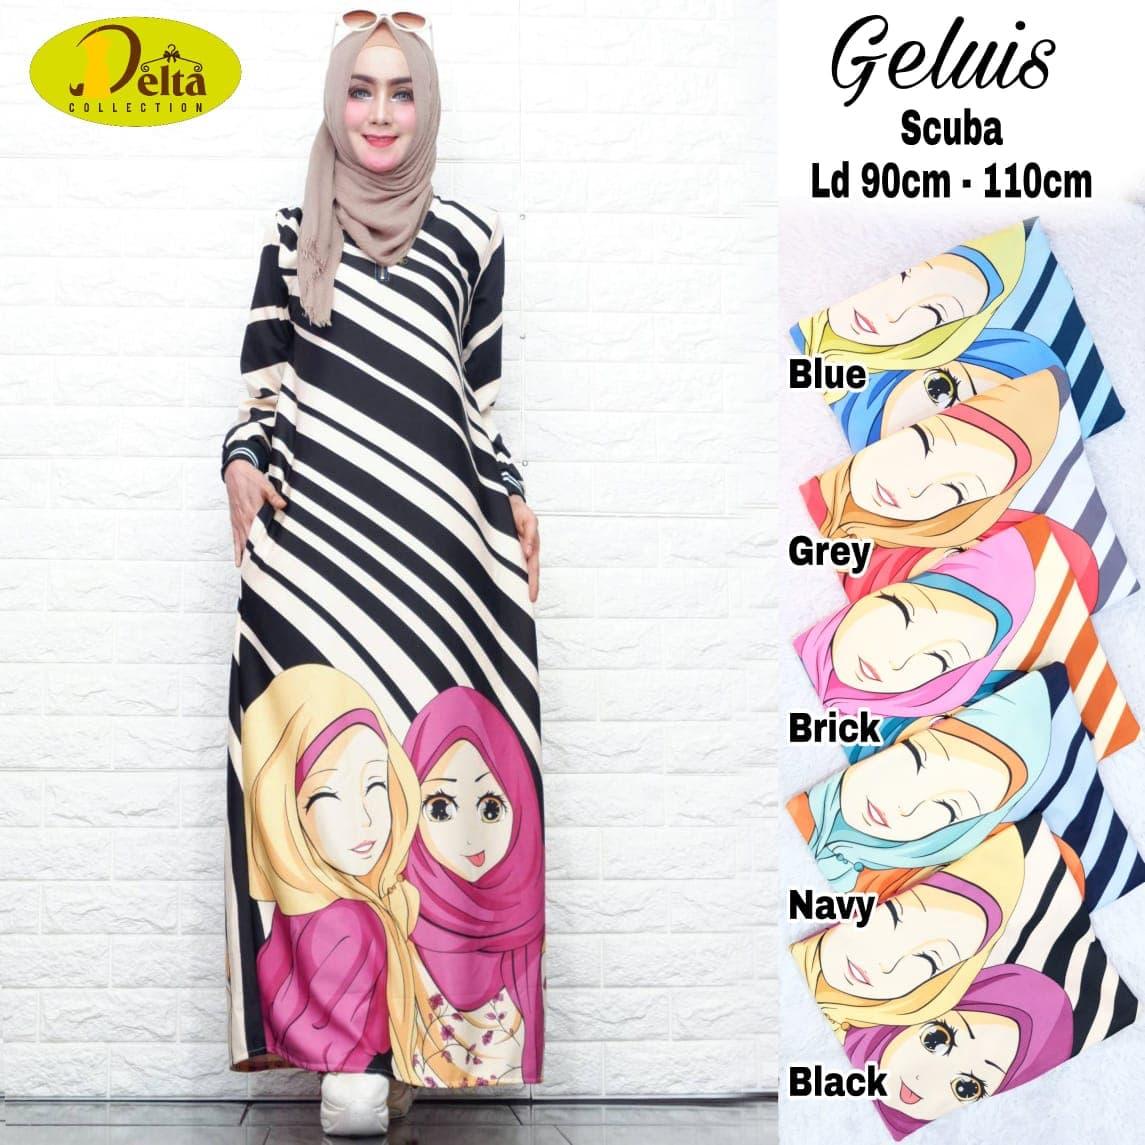 HEMAT Dress Busana Muslimah Gamis Kartun Kekinian Geluis Ori By Delta 787e981e53